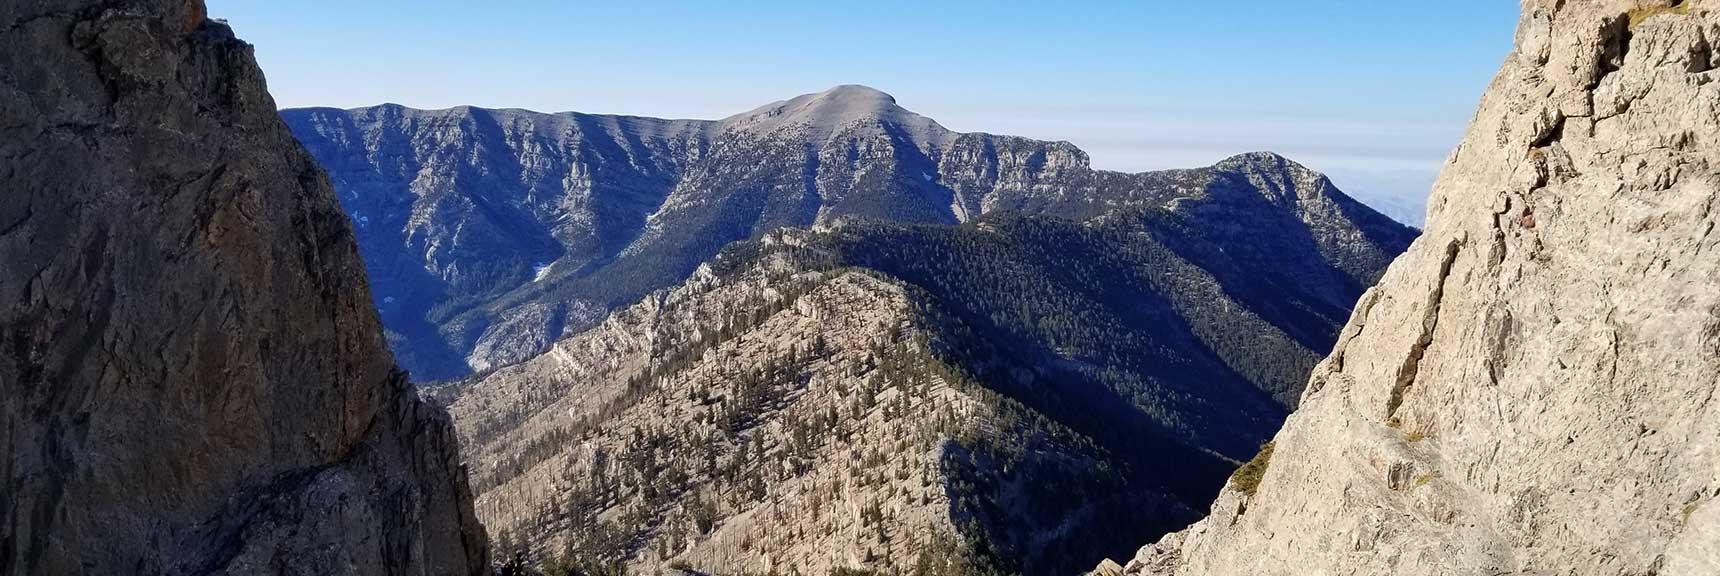 Charleston Peak to Lee Peak and Kyle Canyon North Ridge to Mummy Mountain from Mummy Mt. Summit, Six Peak Circuit Adventure Strategy, Spring Mountains, Nevada